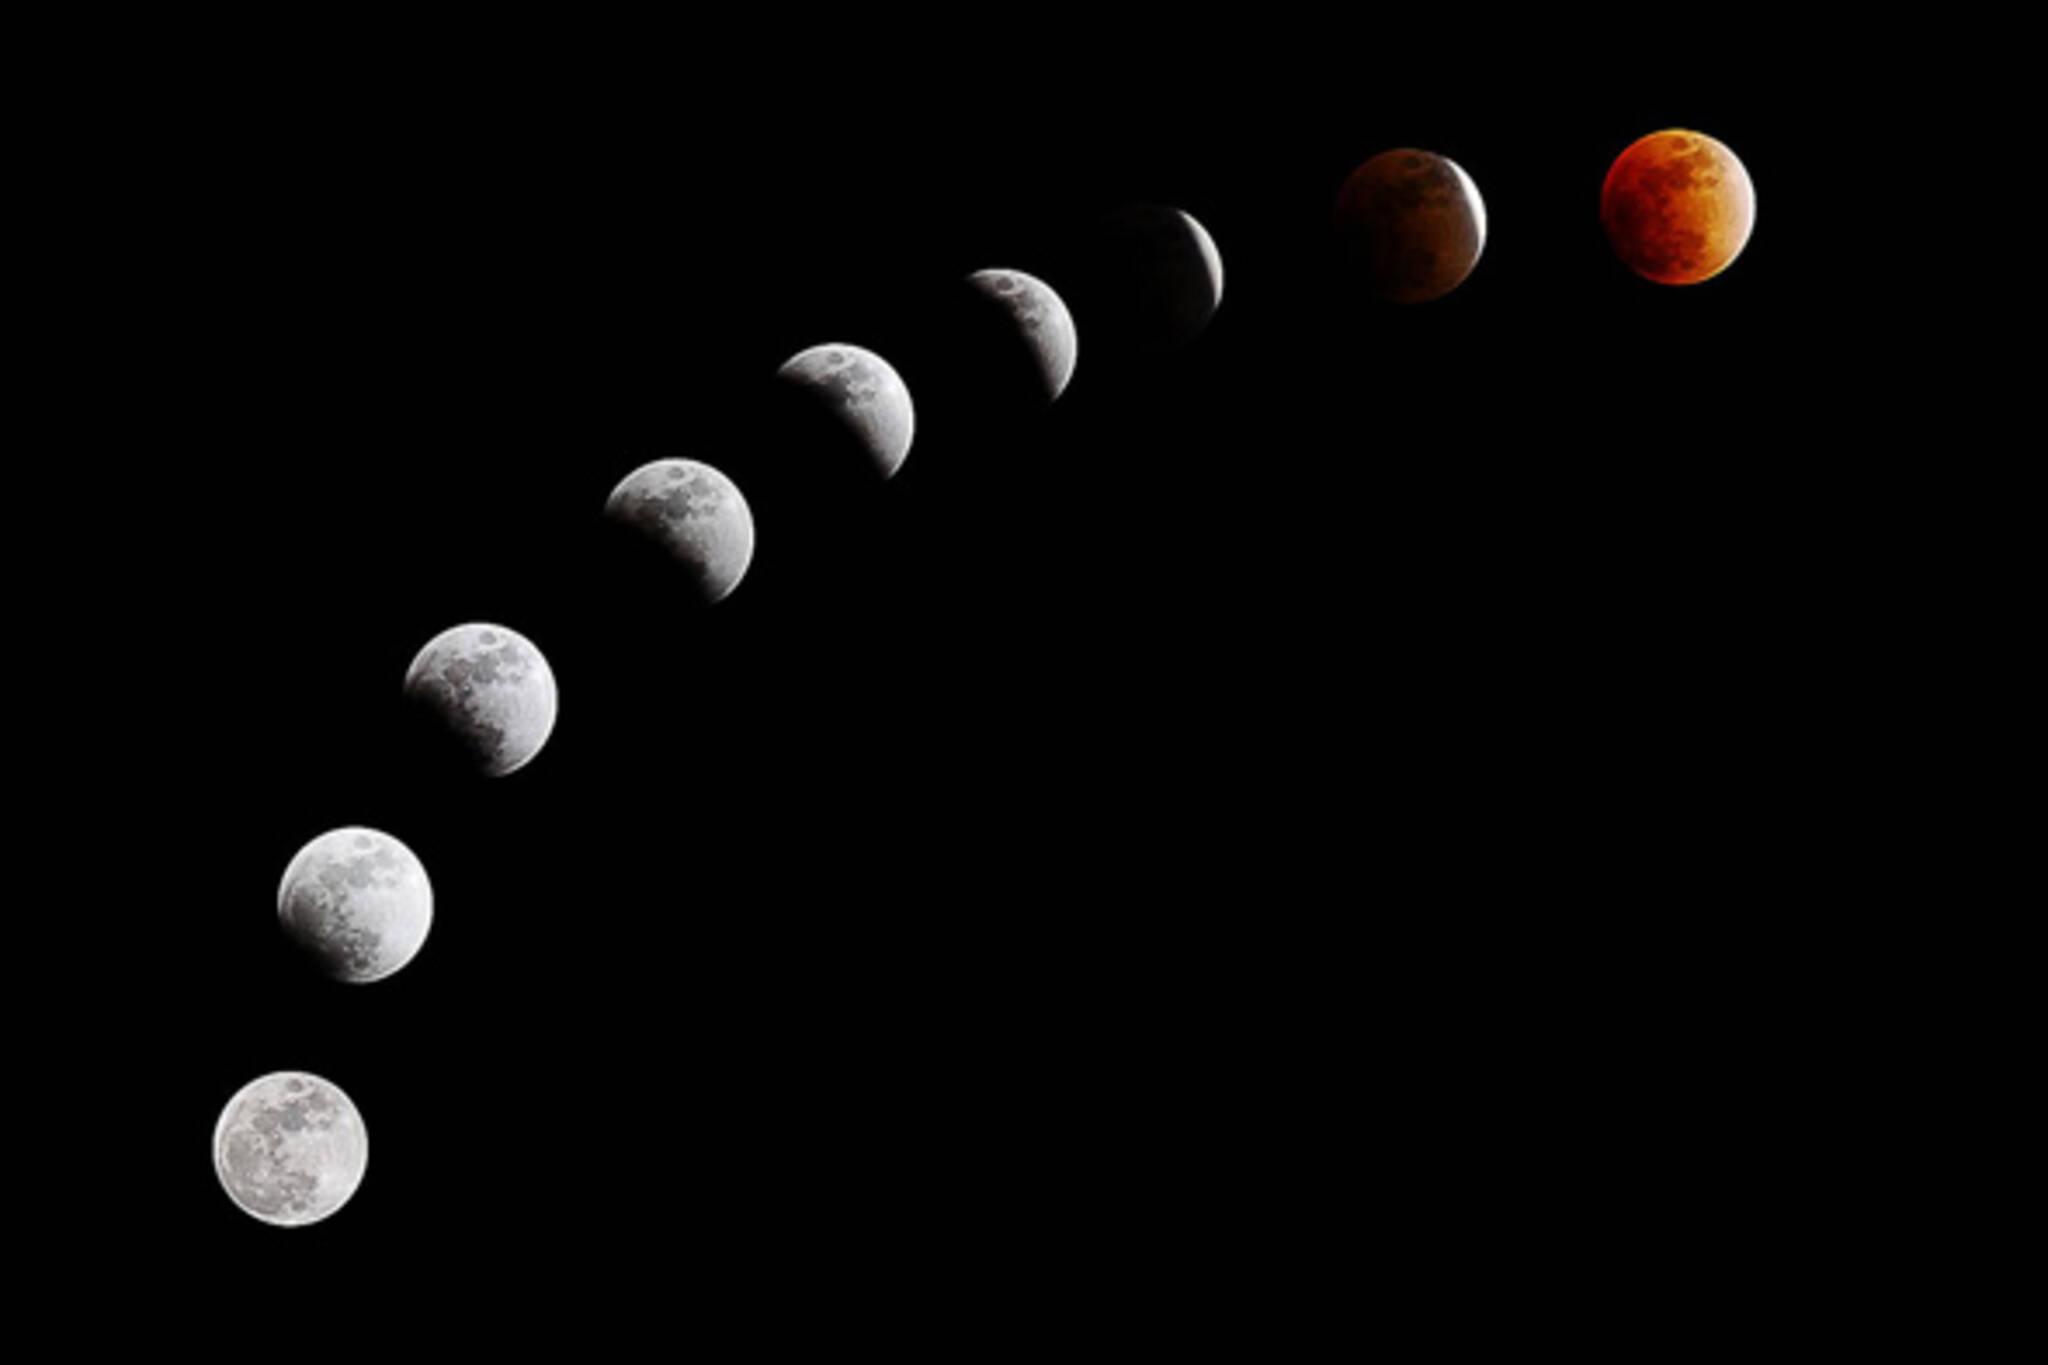 blood moon eclipse toronto - photo #32